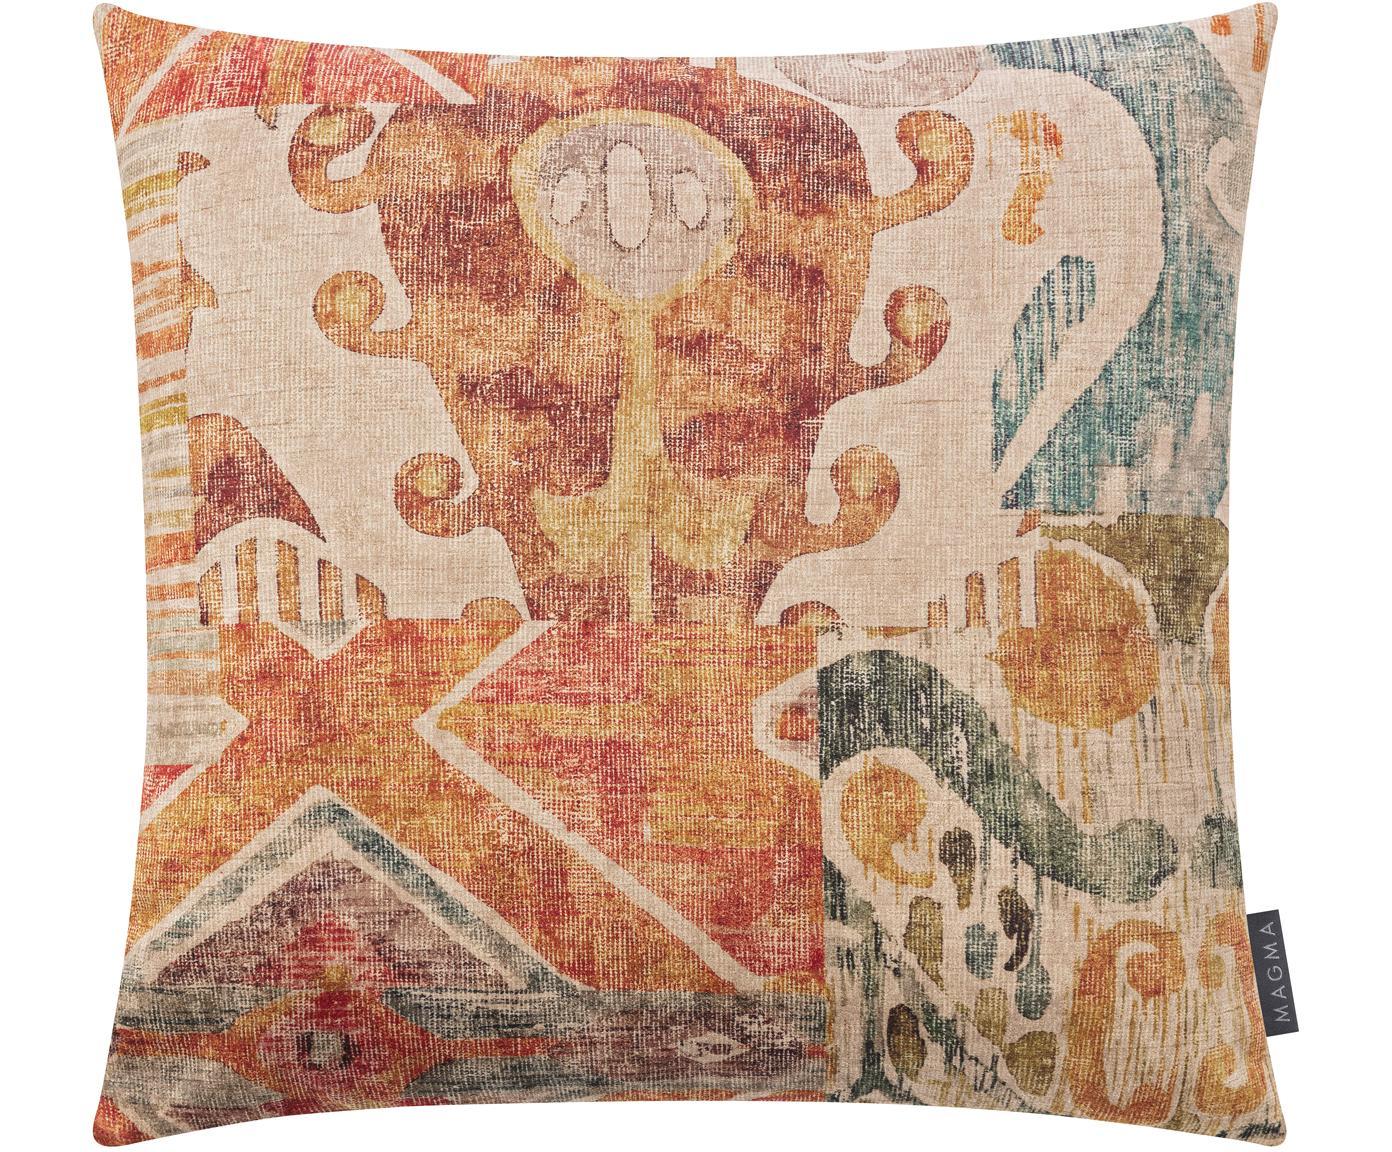 Fluwelen kussenhoes Cosima, 100% polyester fluweel, Oranje, multicolour, 40 x 40 cm